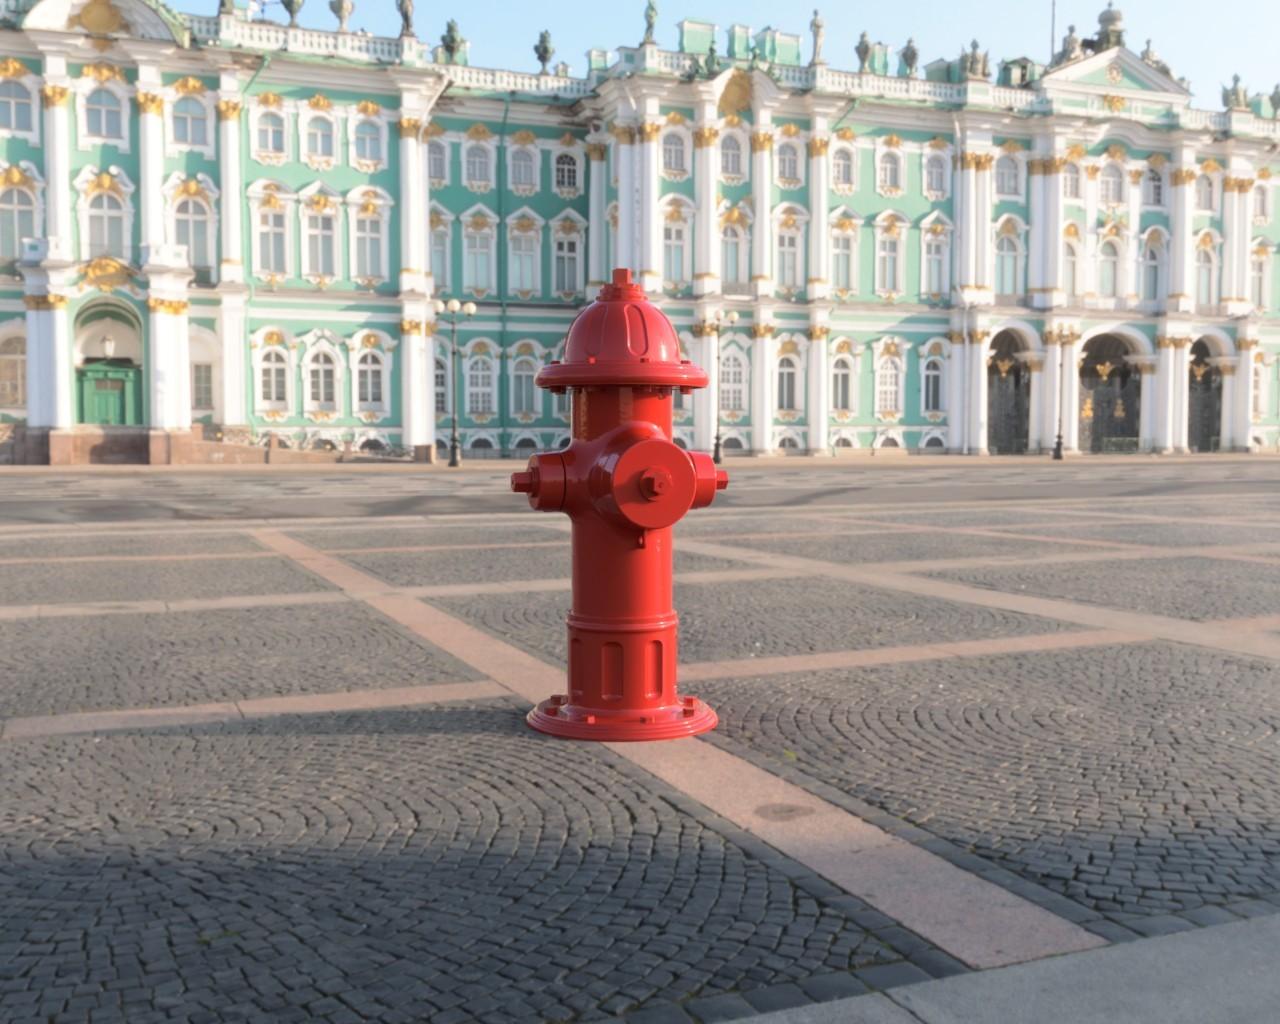 Fire_hydrant_2017-Nov-09_02-00-48PM-000_CustomizedView33956057940_jpg.jpg Download STL file Fire hydrant • Model to 3D print, AntonShtern